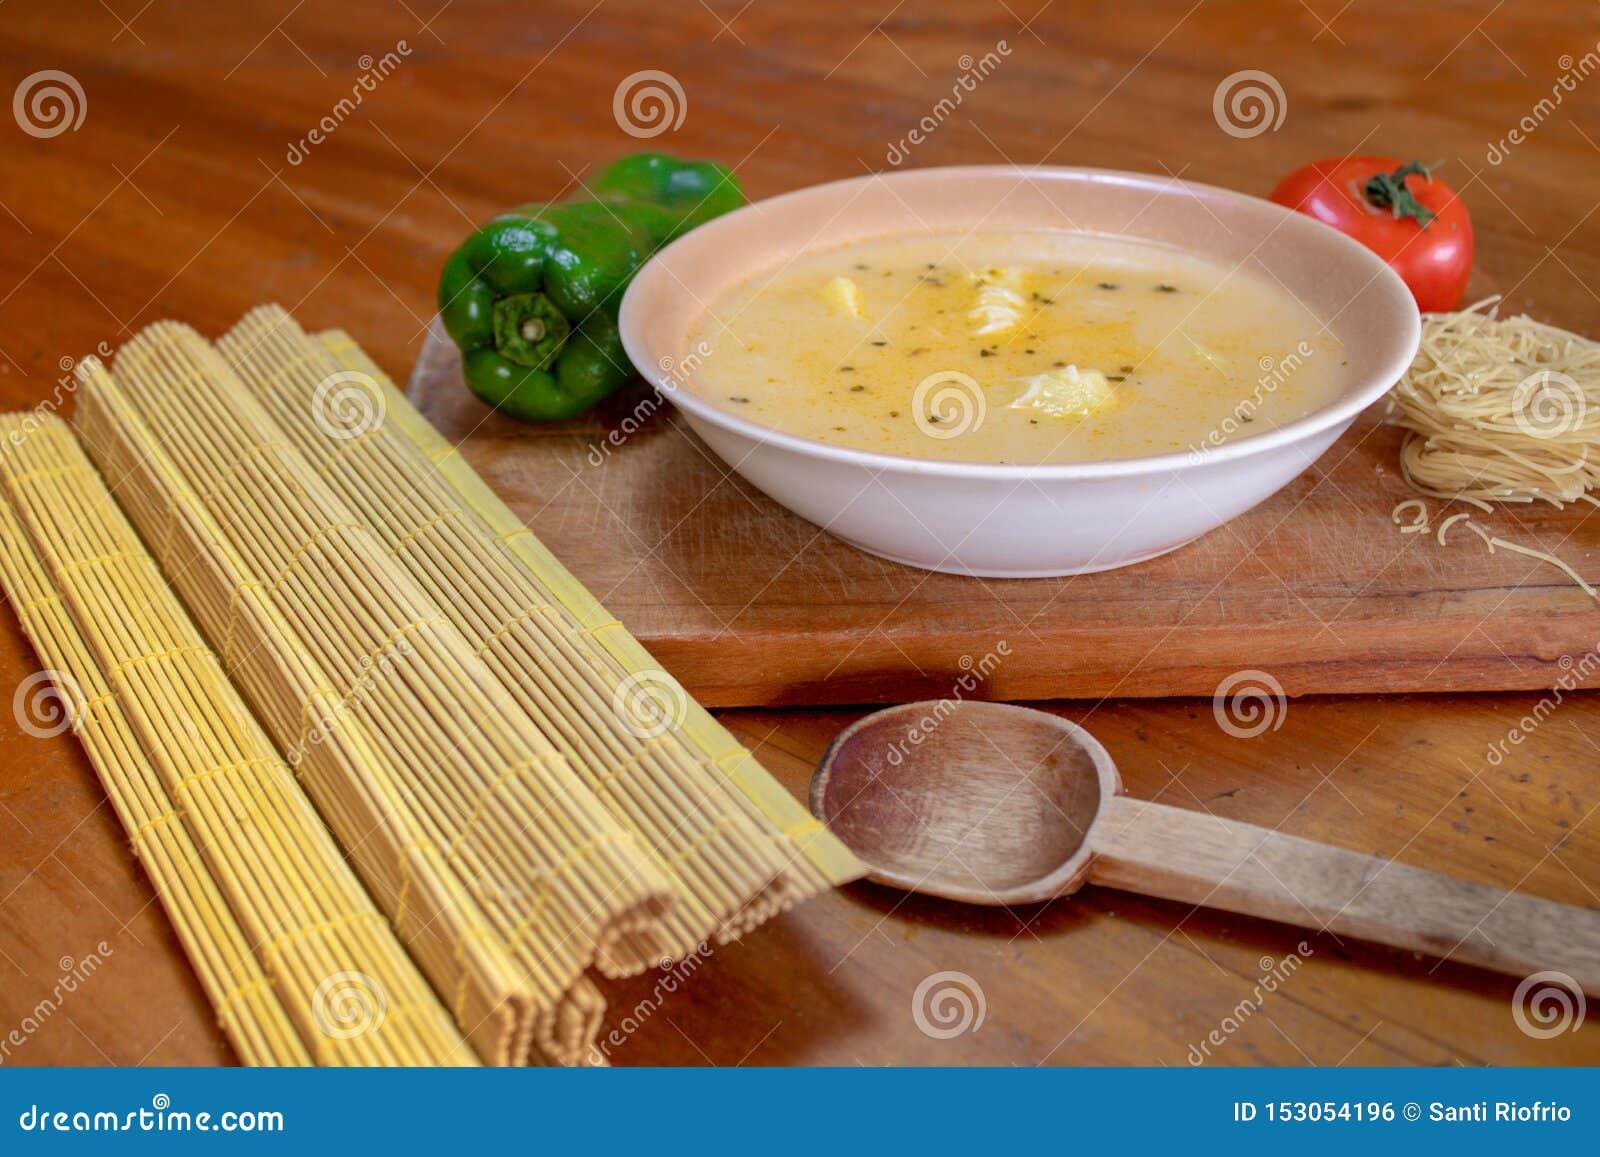 Sopa de macarronete caseiro com ingredientes